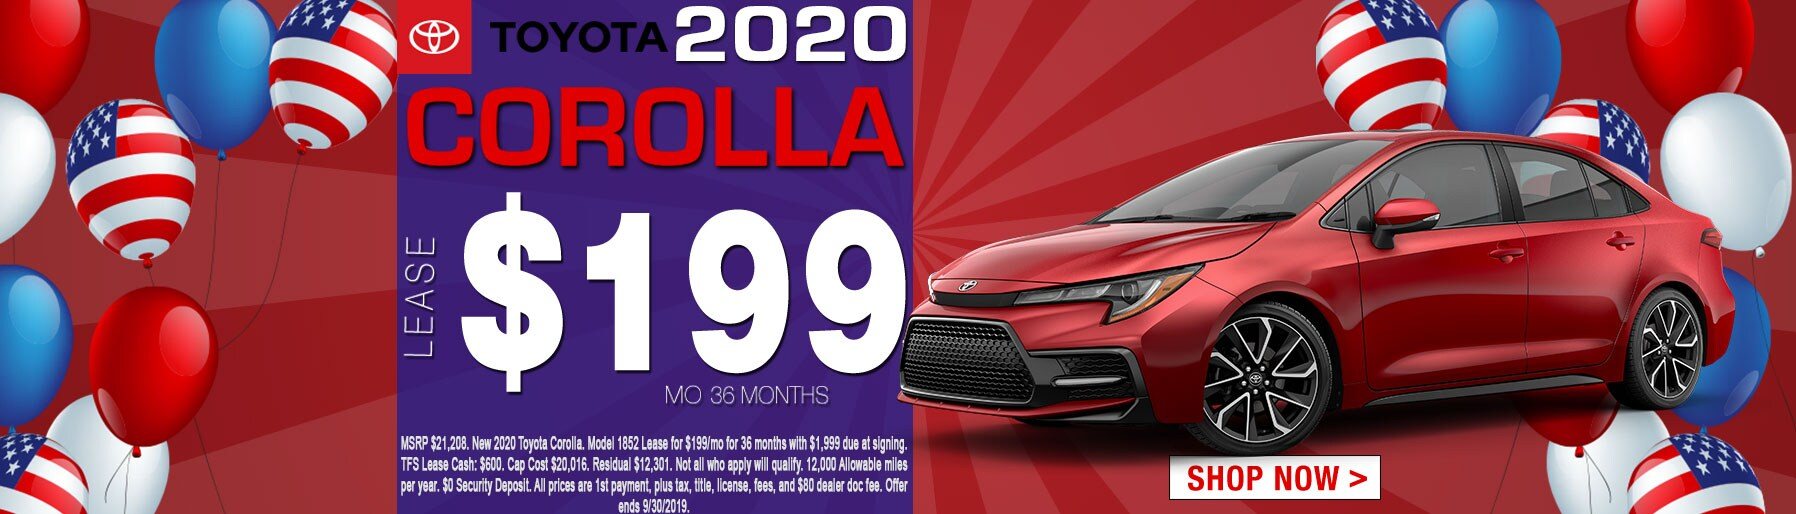 Larry H Miller Toyota Corona >> Larry H. Miller Toyota Corona | New & Used Car Dealer Corona